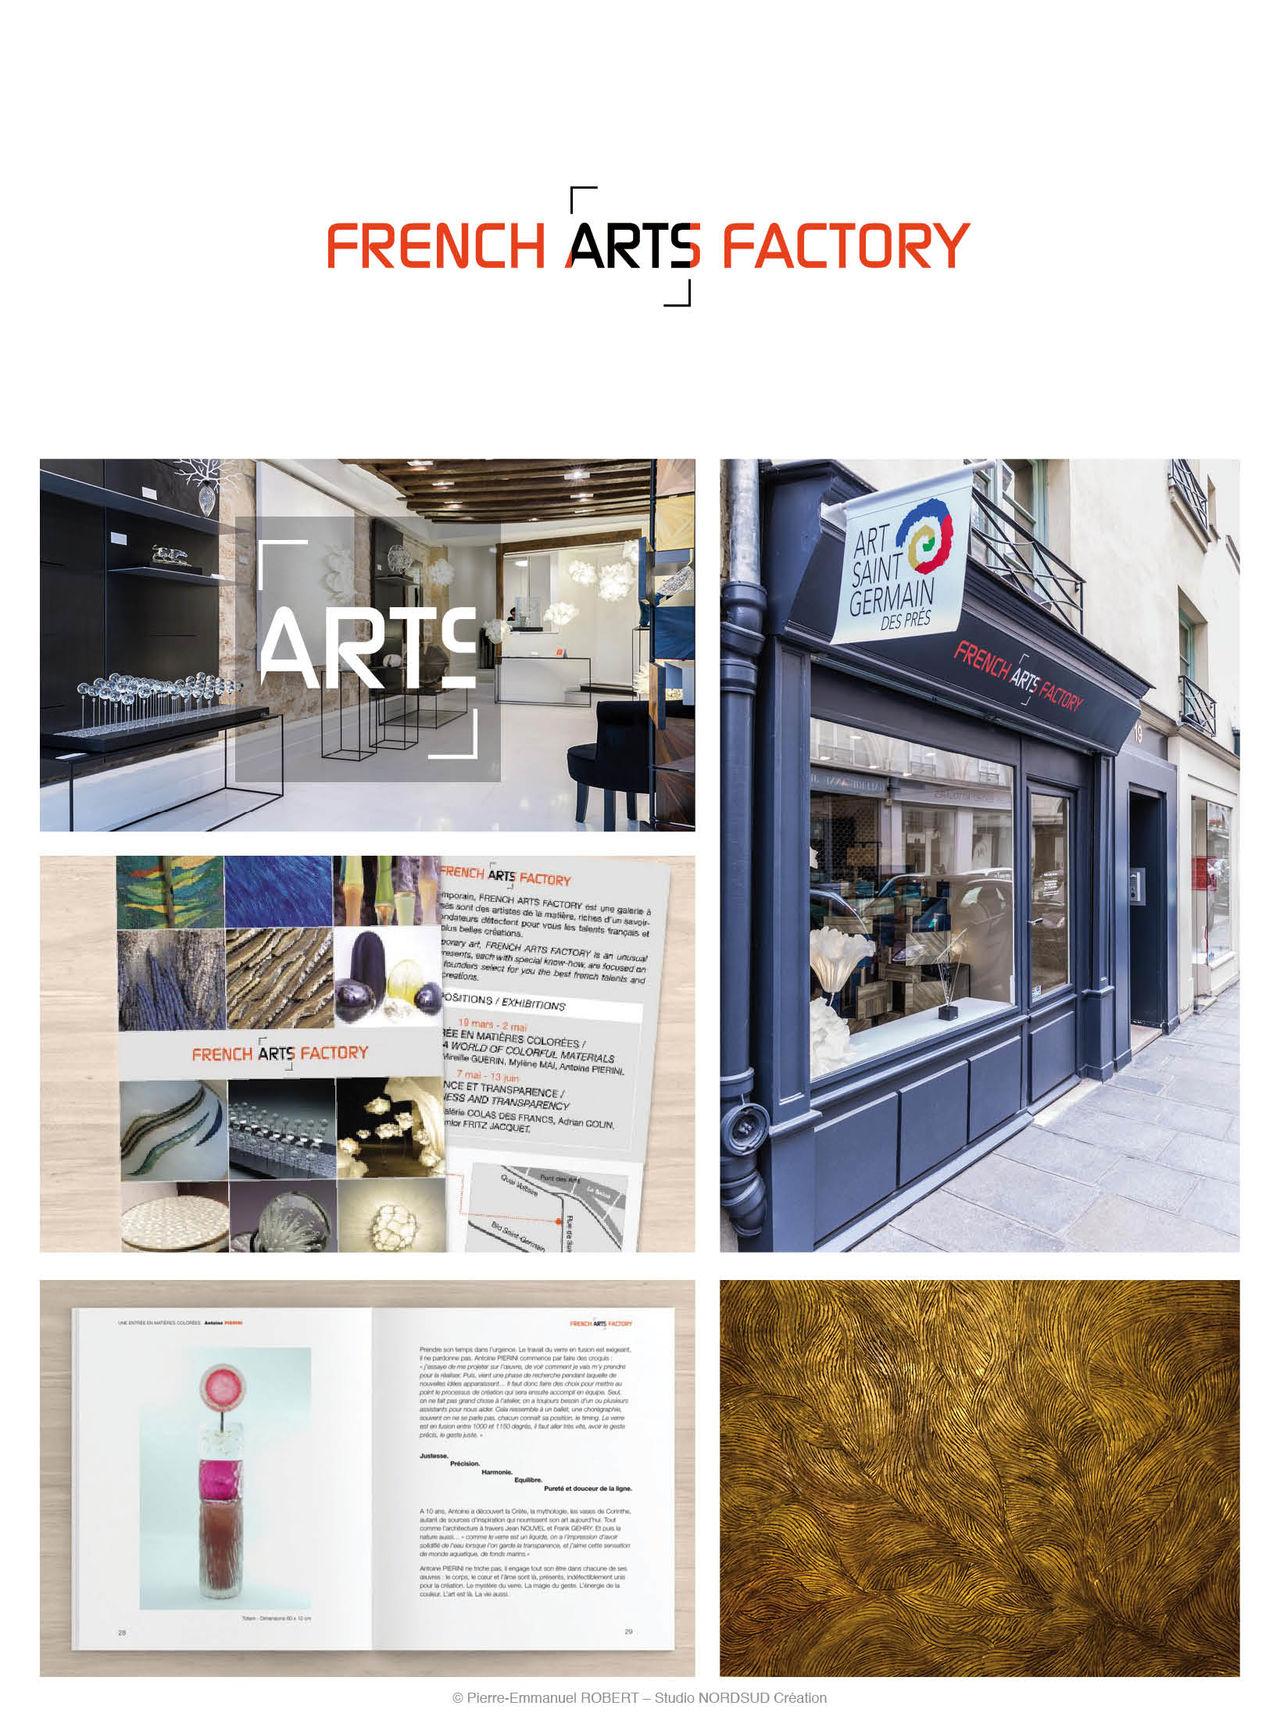 Création du logo French Arts Factory